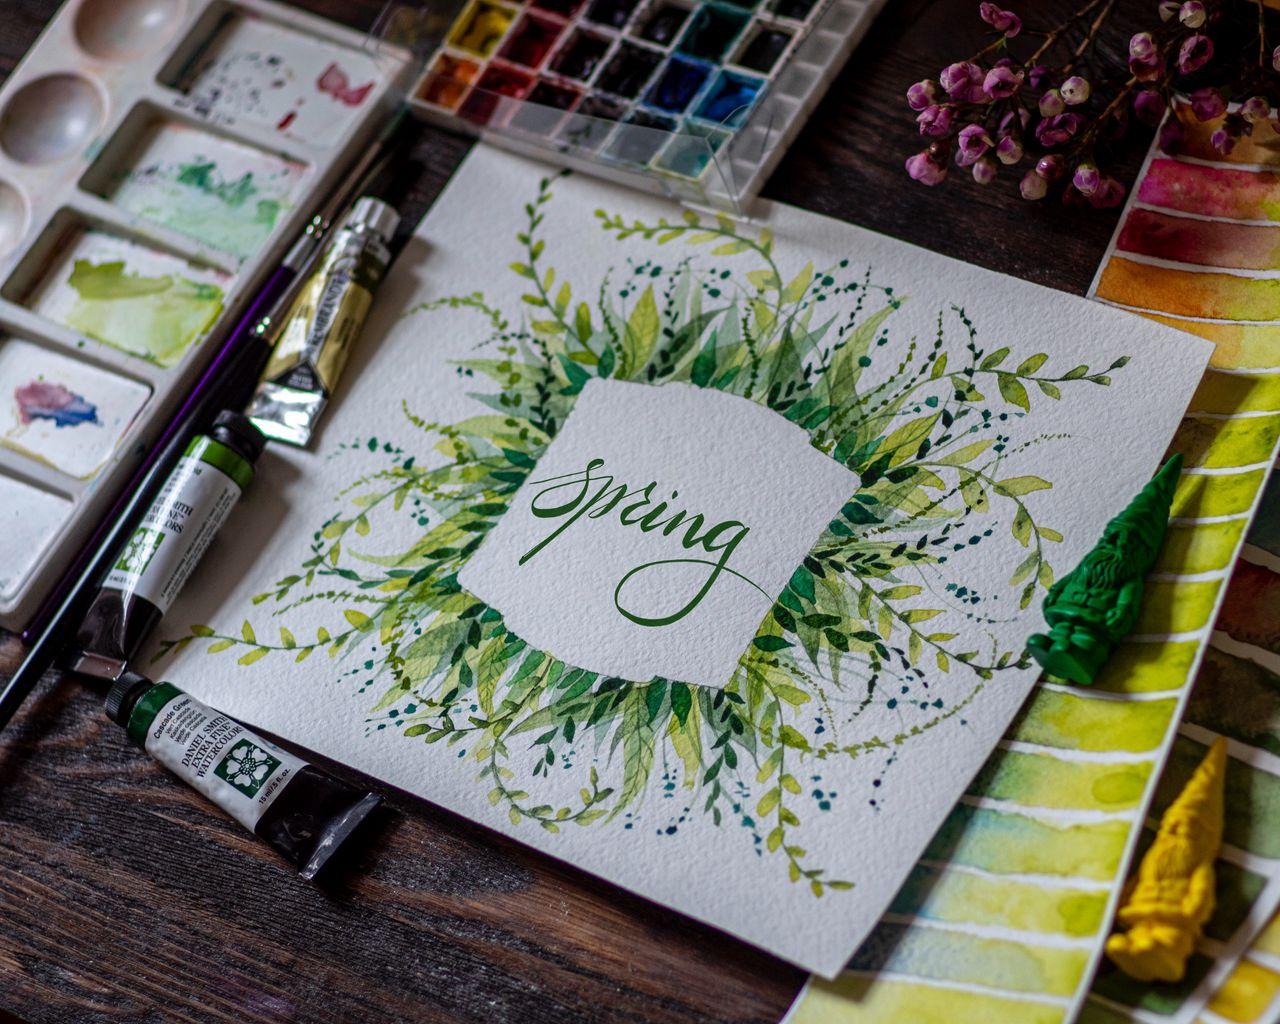 1280x1024 Обои весна, слово, леттеринг, краски, акварель